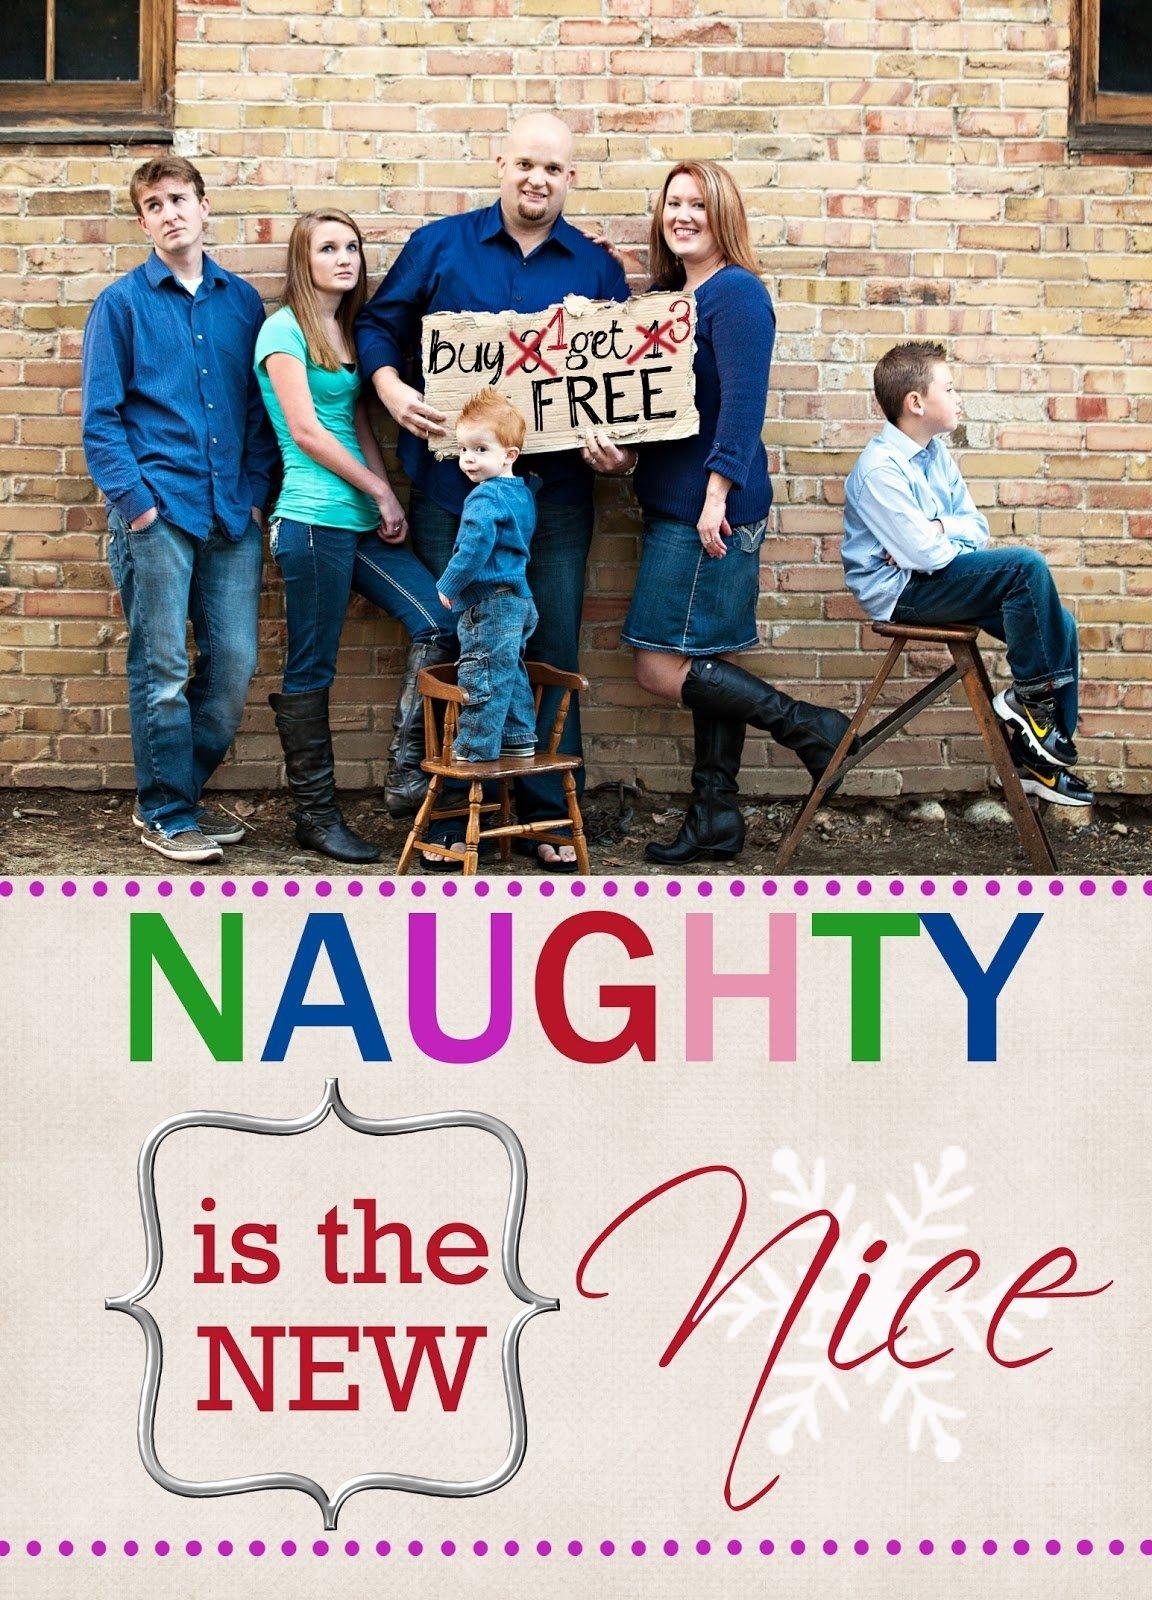 10 Unique Funny Family Christmas Picture Ideas 61c996cbb5521baabdcfcfcd842800f8 736x1030 christmas 2021